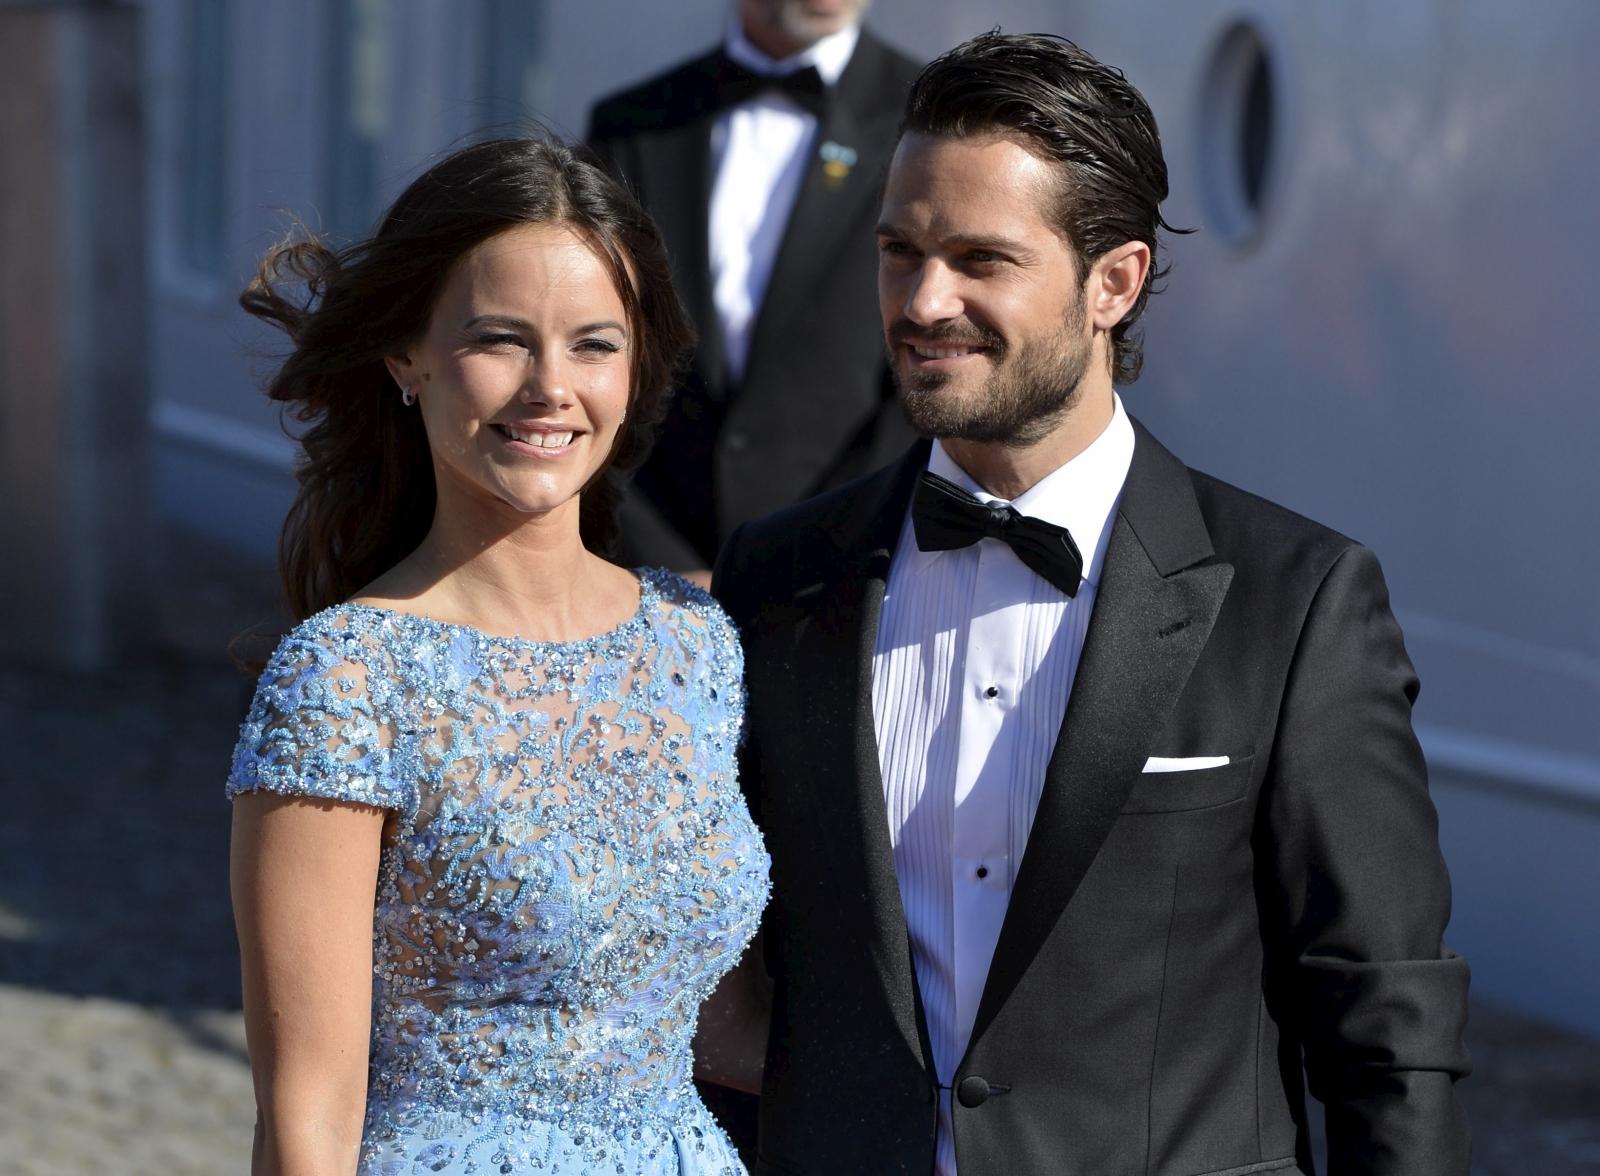 Swedish royal couple